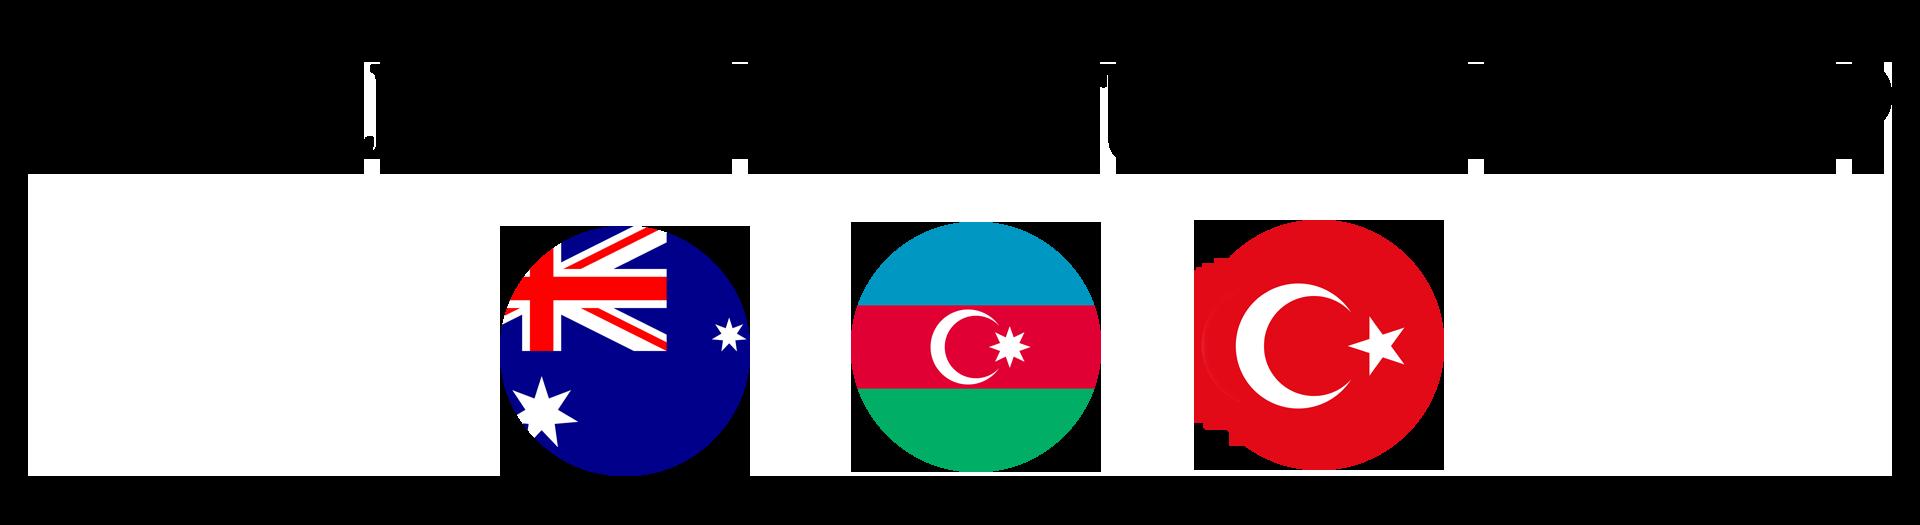 Australian-Azerbaijani-Turkish Friendship